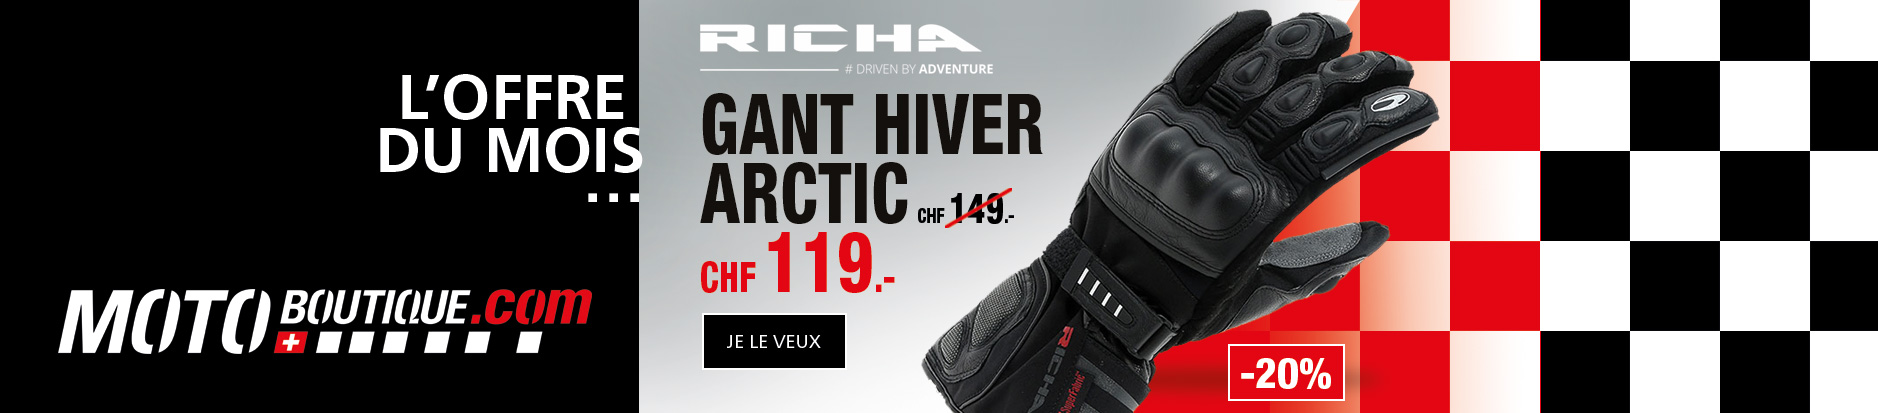 Richa Arctic